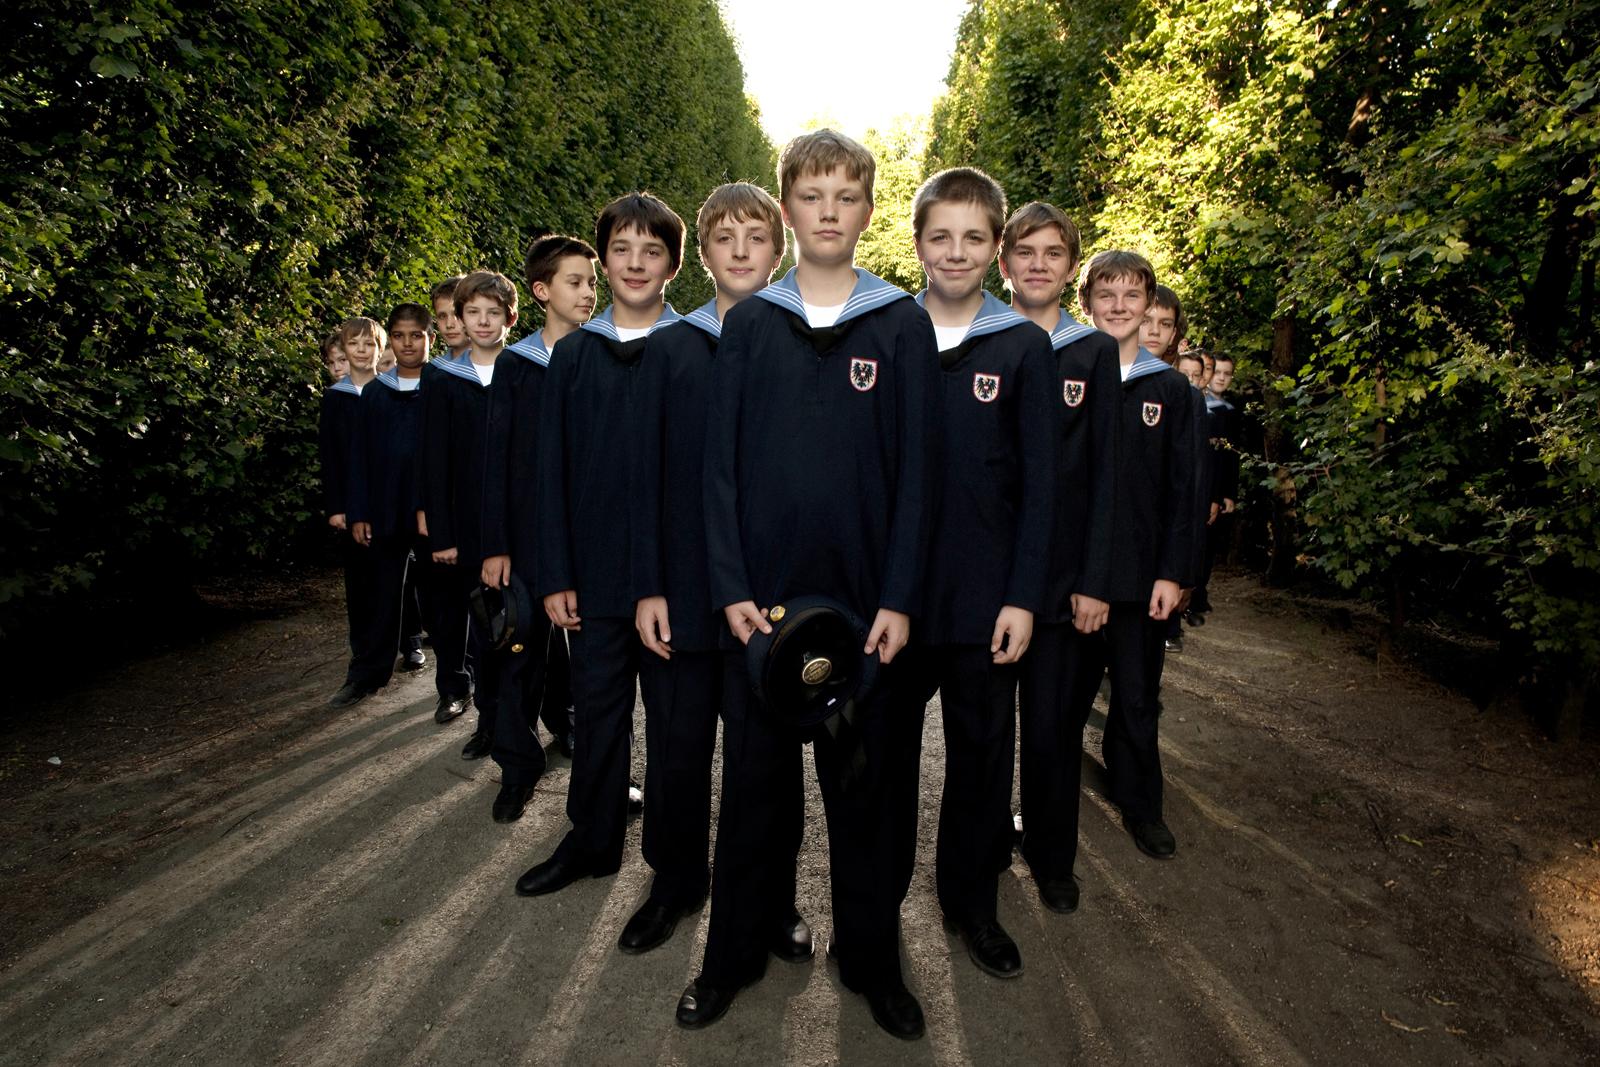 Members of the Vienna Boys Choir